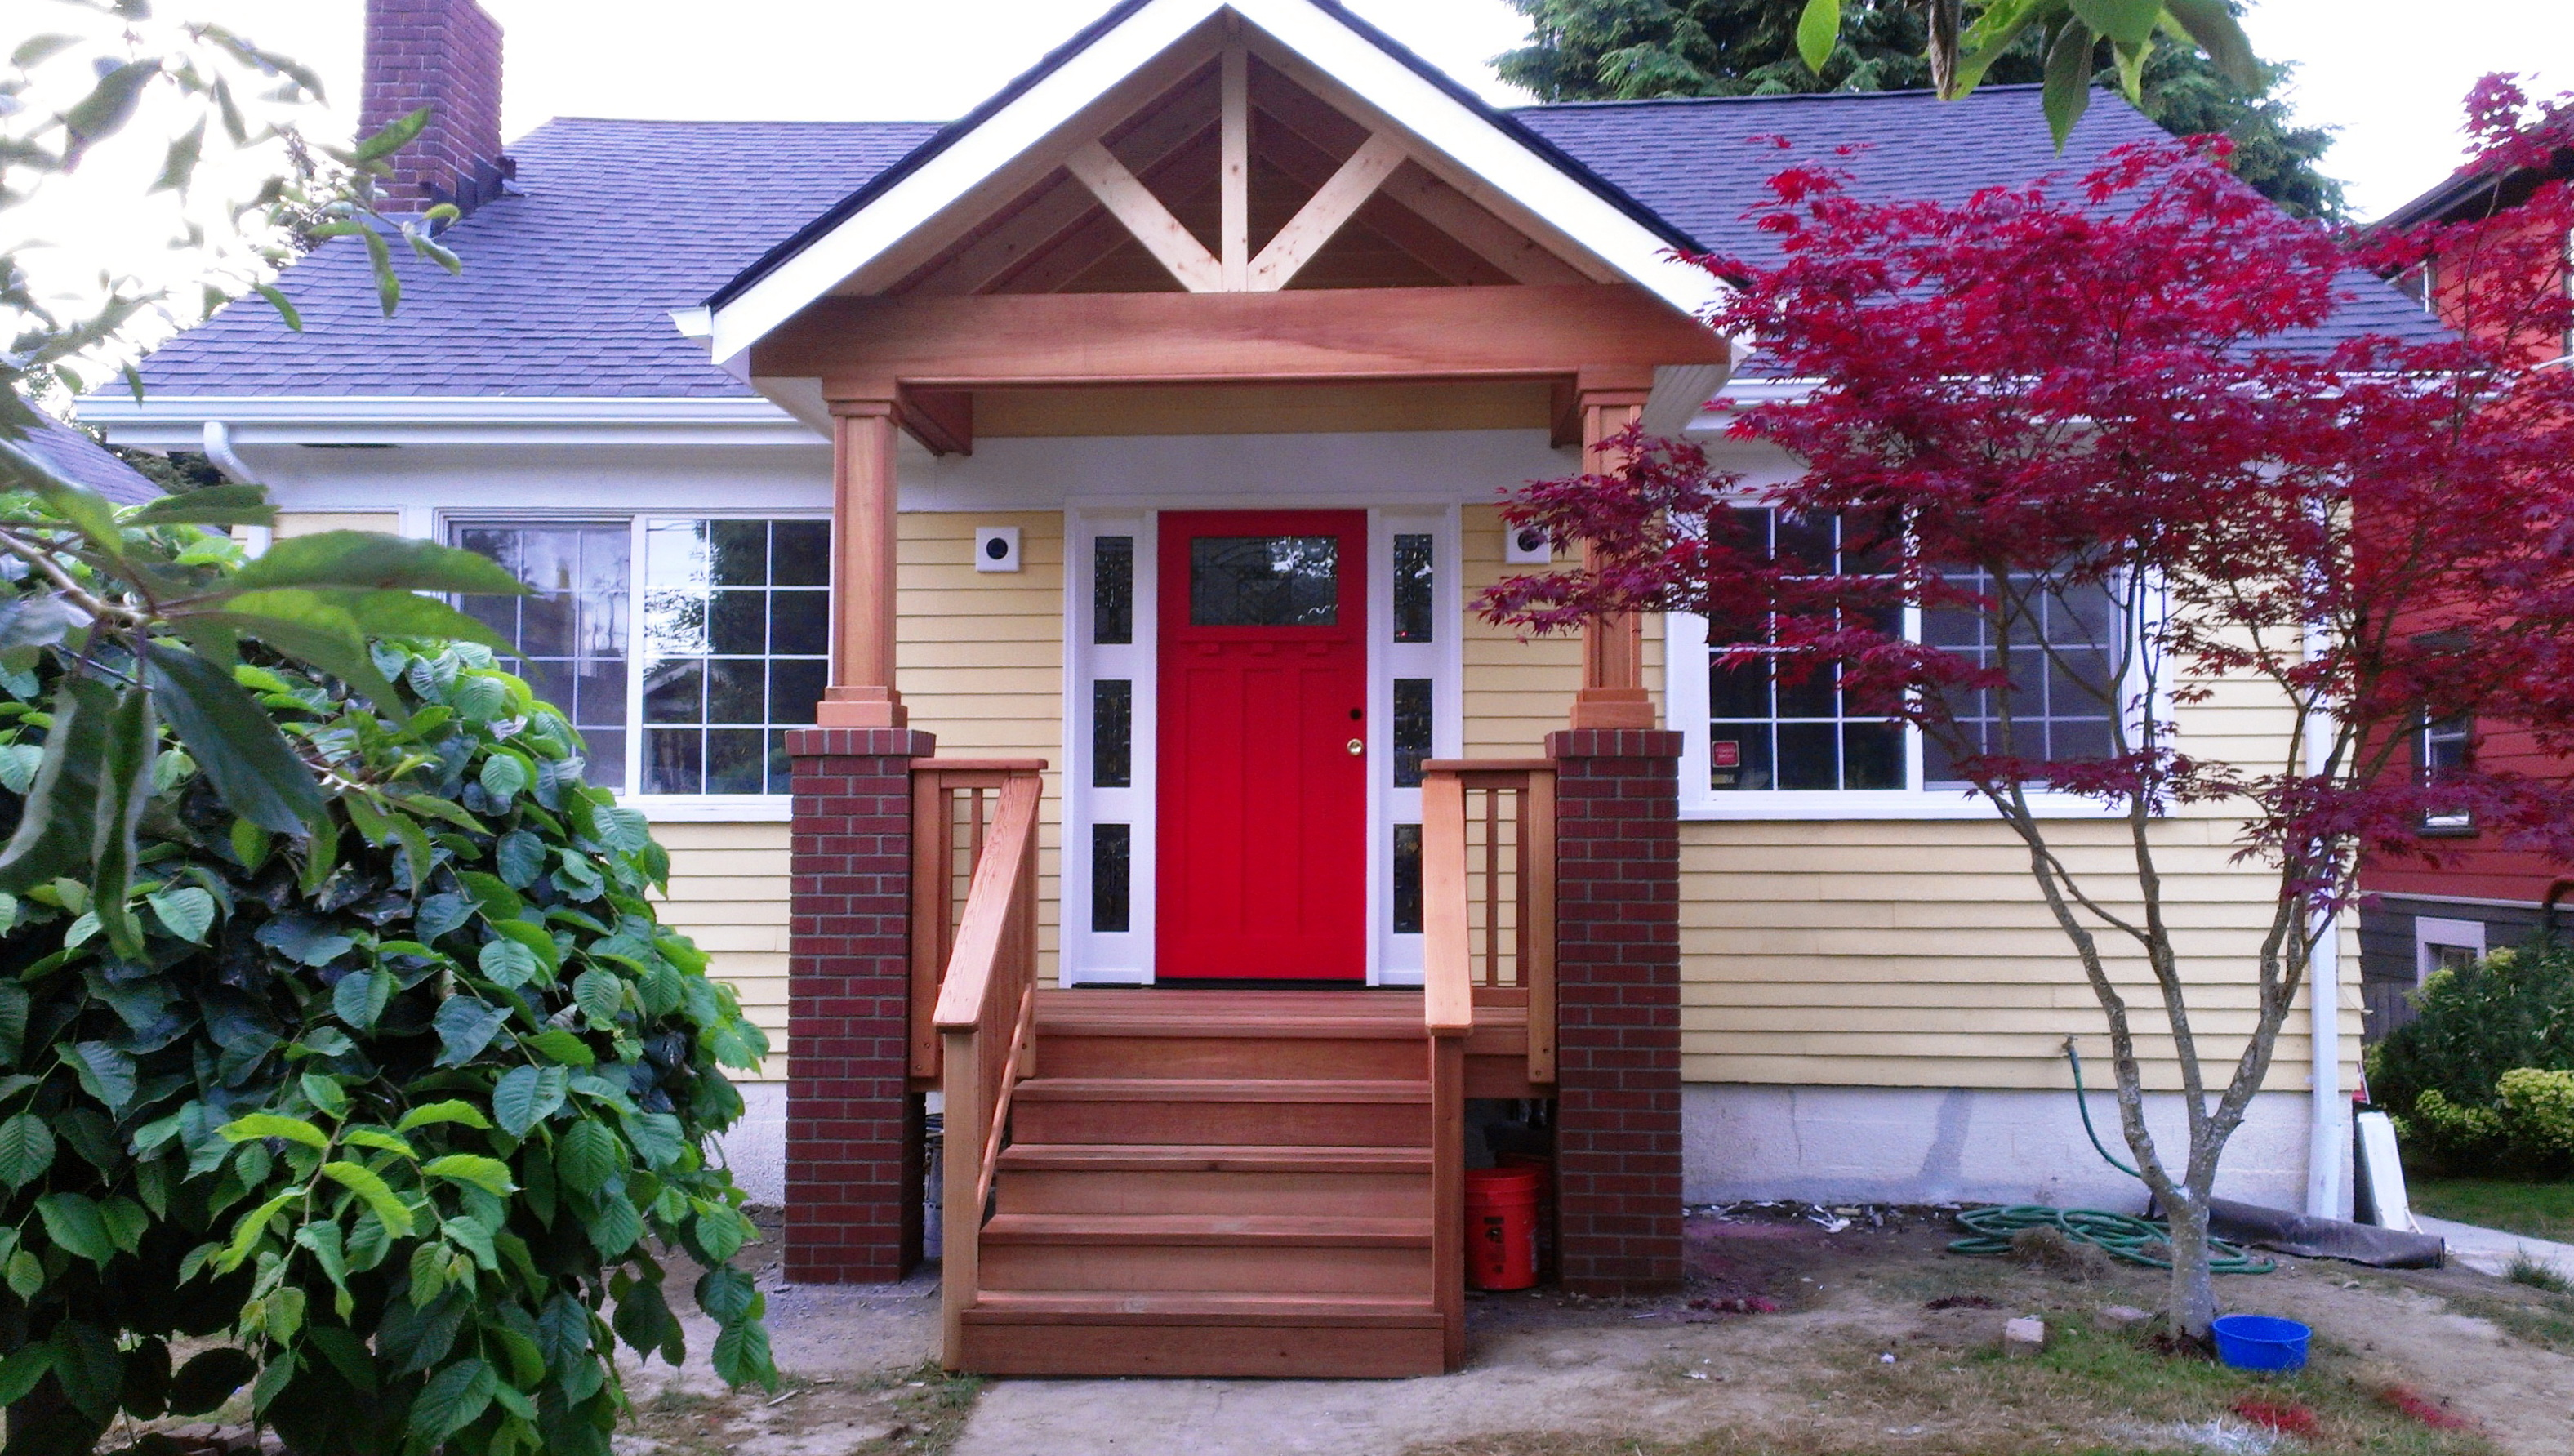 Adding A Porch To A Brick House